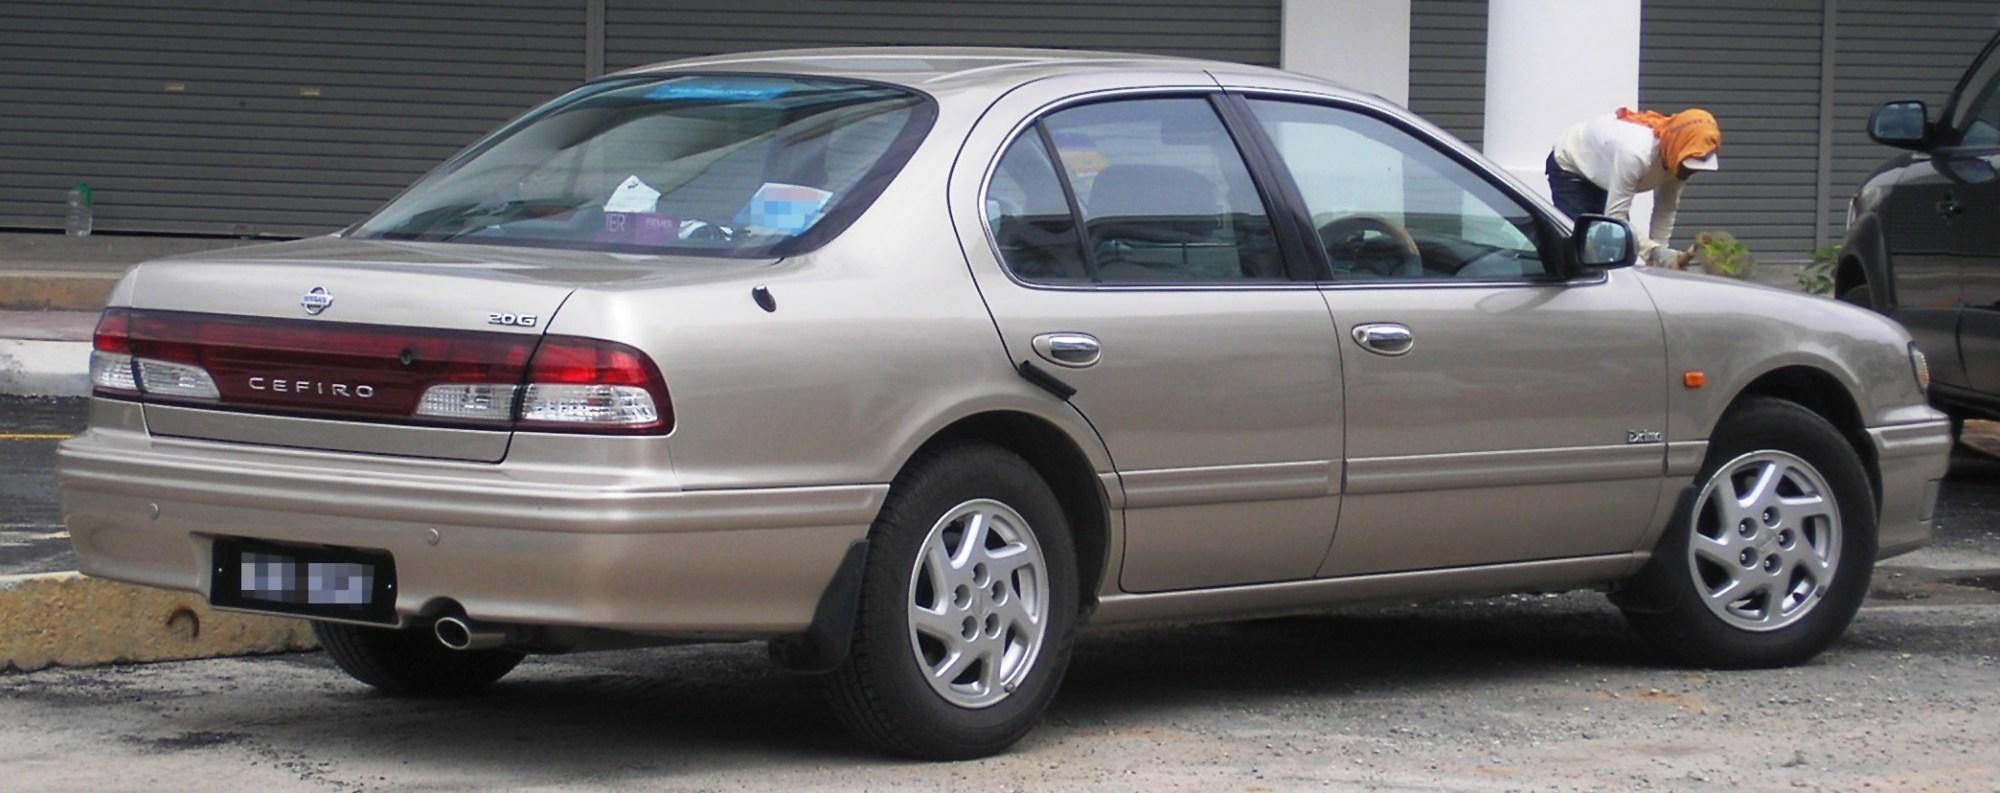 Nissan Cefiro Wiring Diagram 2001 Engine Hight Resolution Of